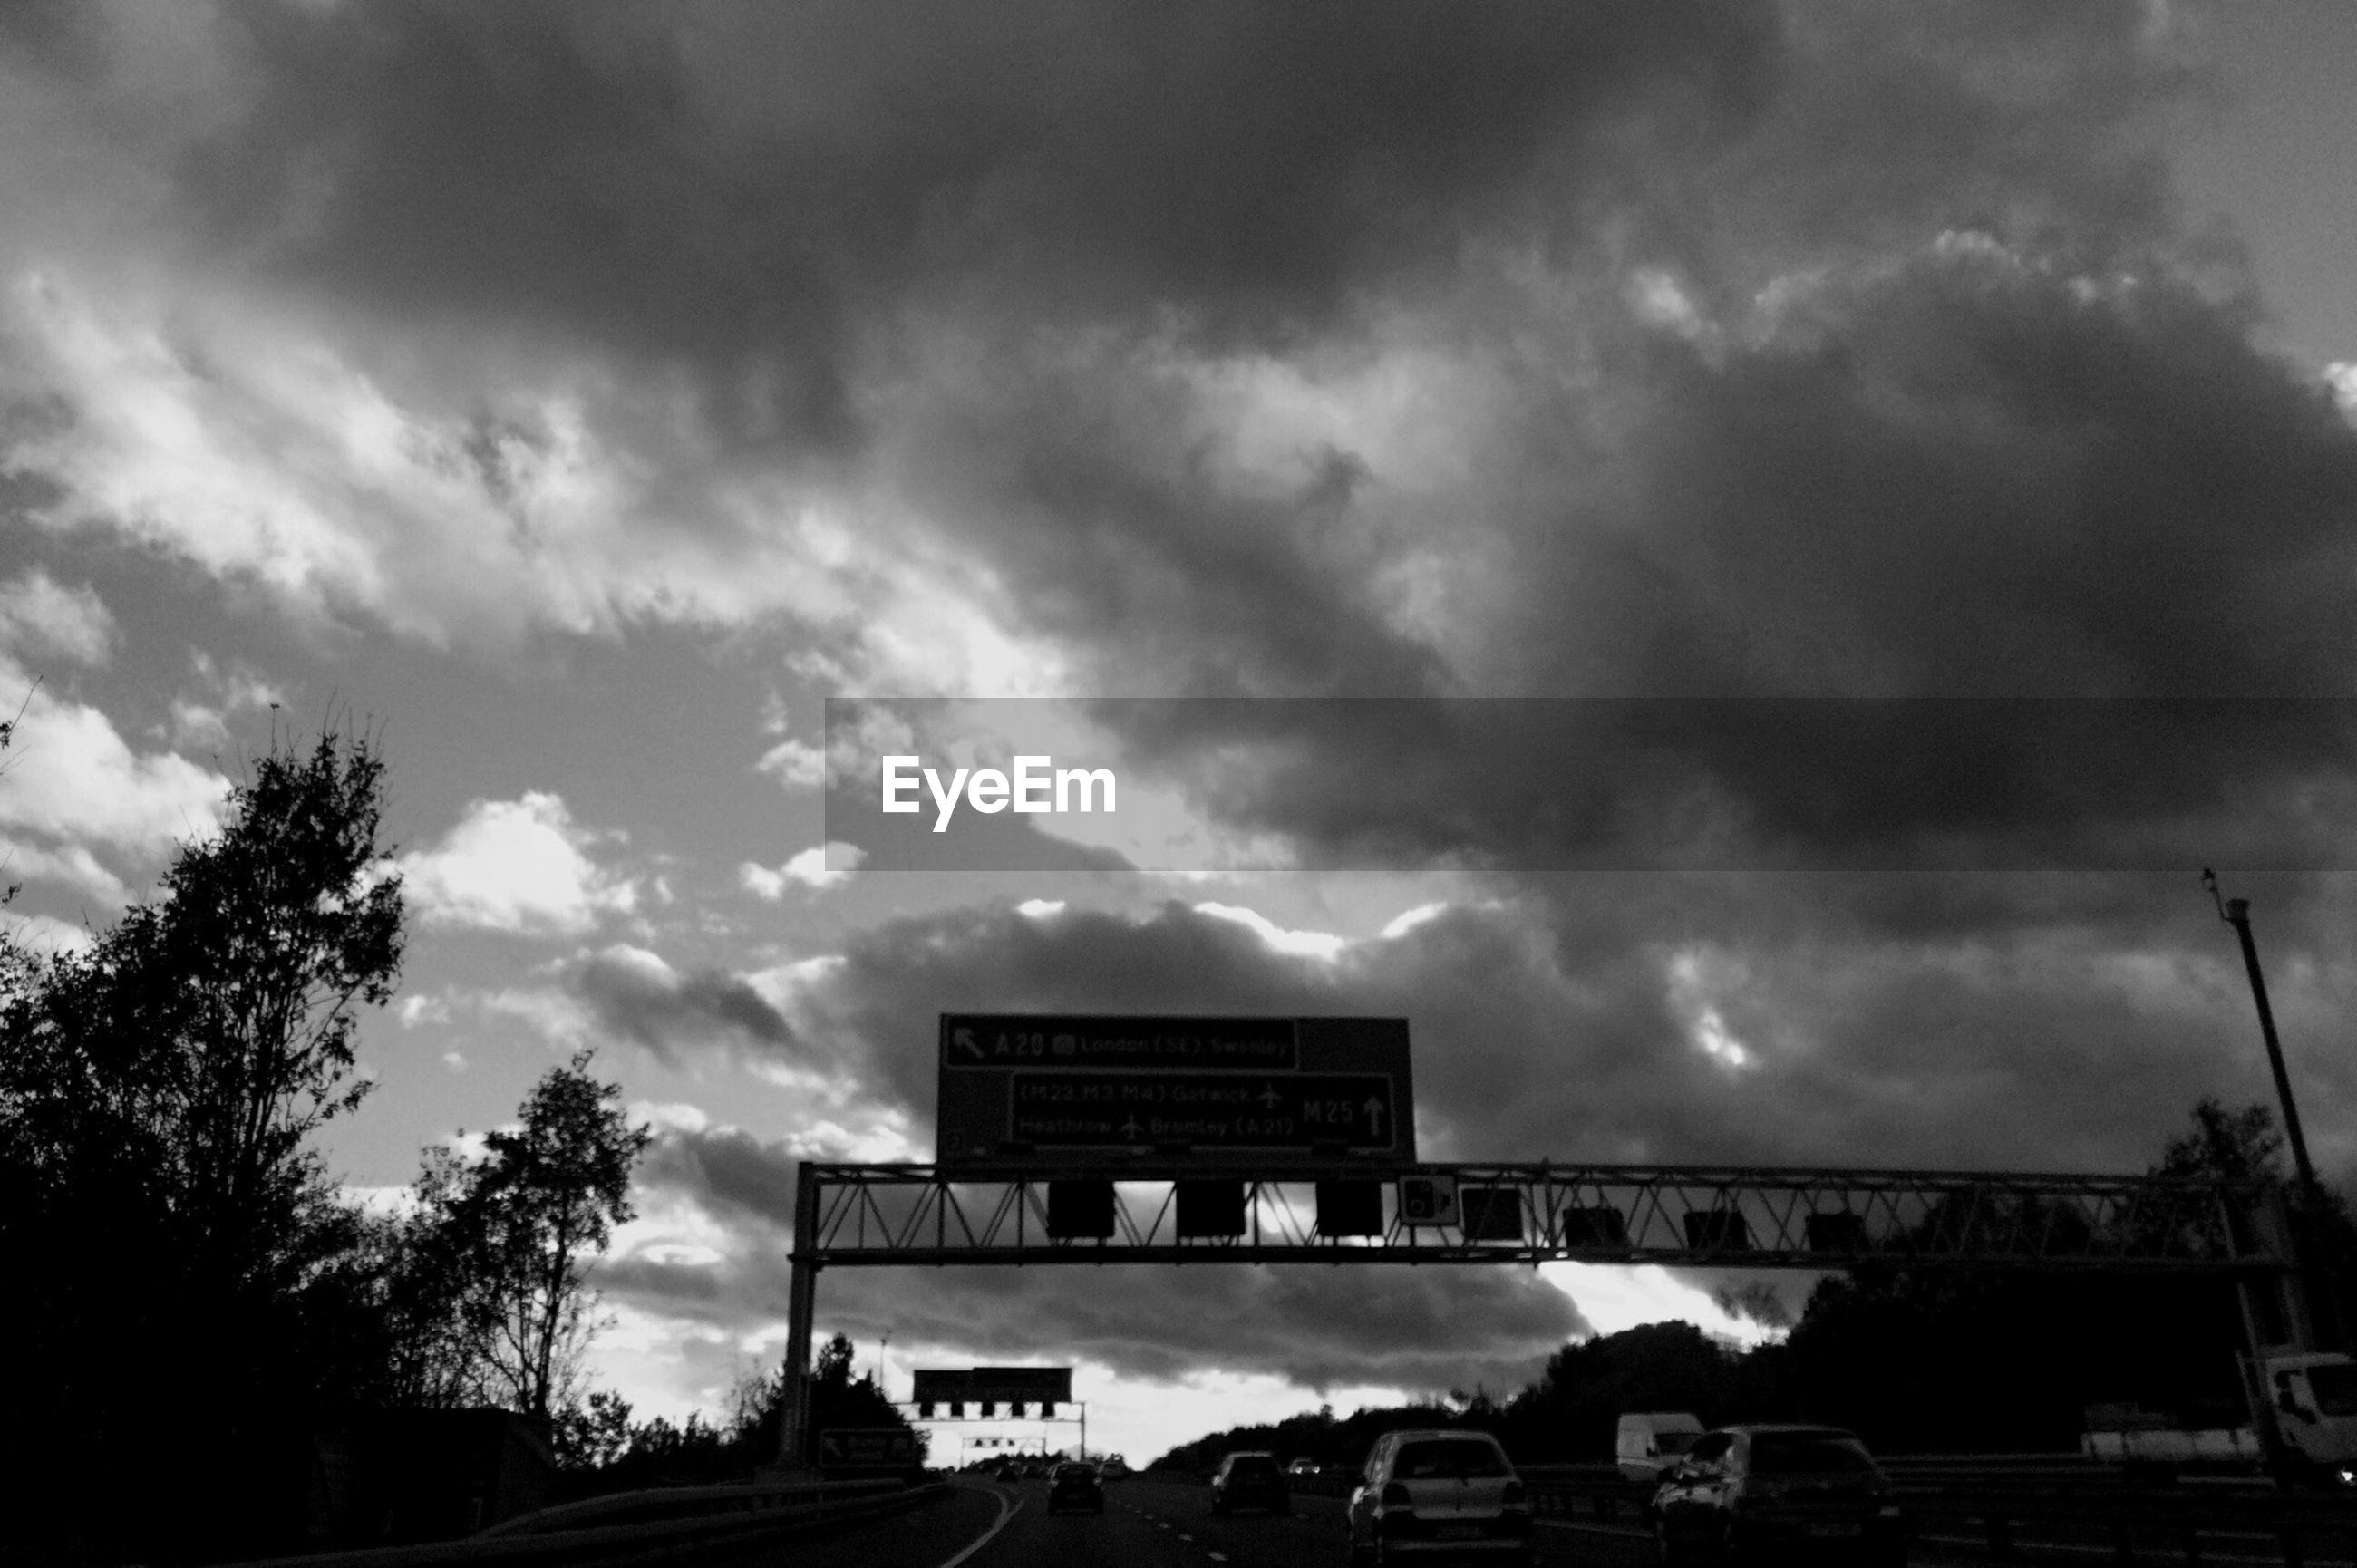 sky, cloud - sky, cloudy, built structure, weather, overcast, architecture, building exterior, cloud, storm cloud, low angle view, tree, outdoors, dramatic sky, cloudscape, transportation, nature, railing, house, dusk